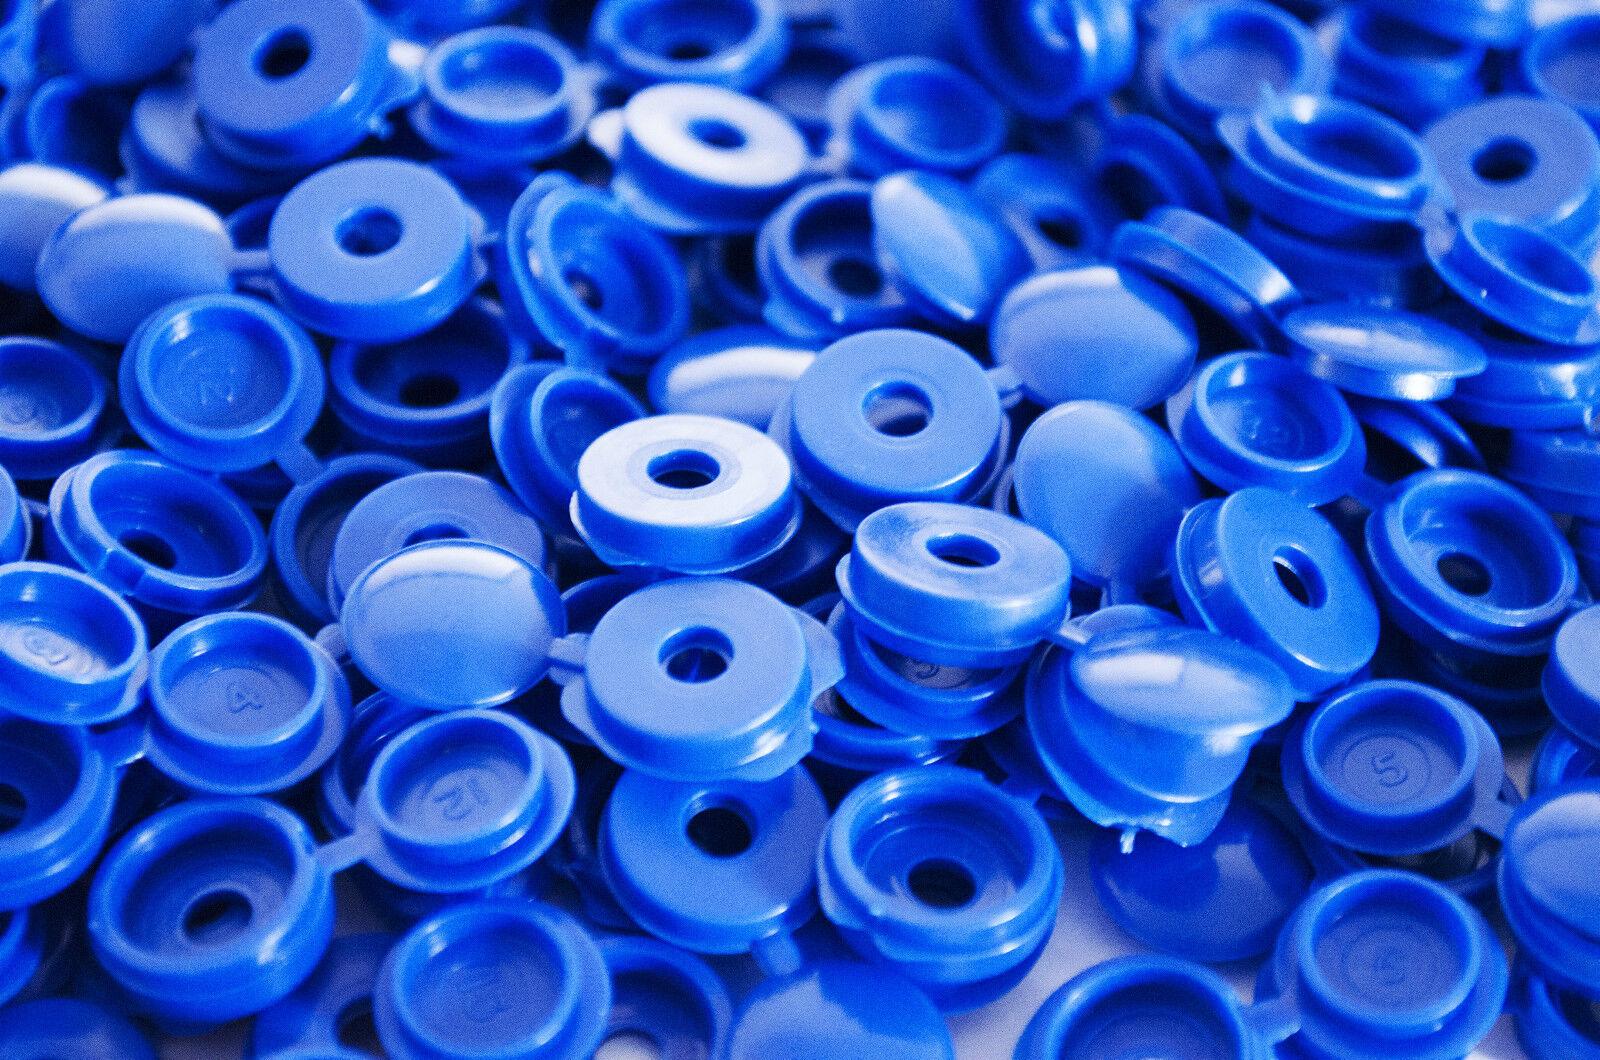 50 x tapones de Tapa tornillo plástico azul con Bisagras pliegue sobre Fit Size 6-8 calibre Tornillos